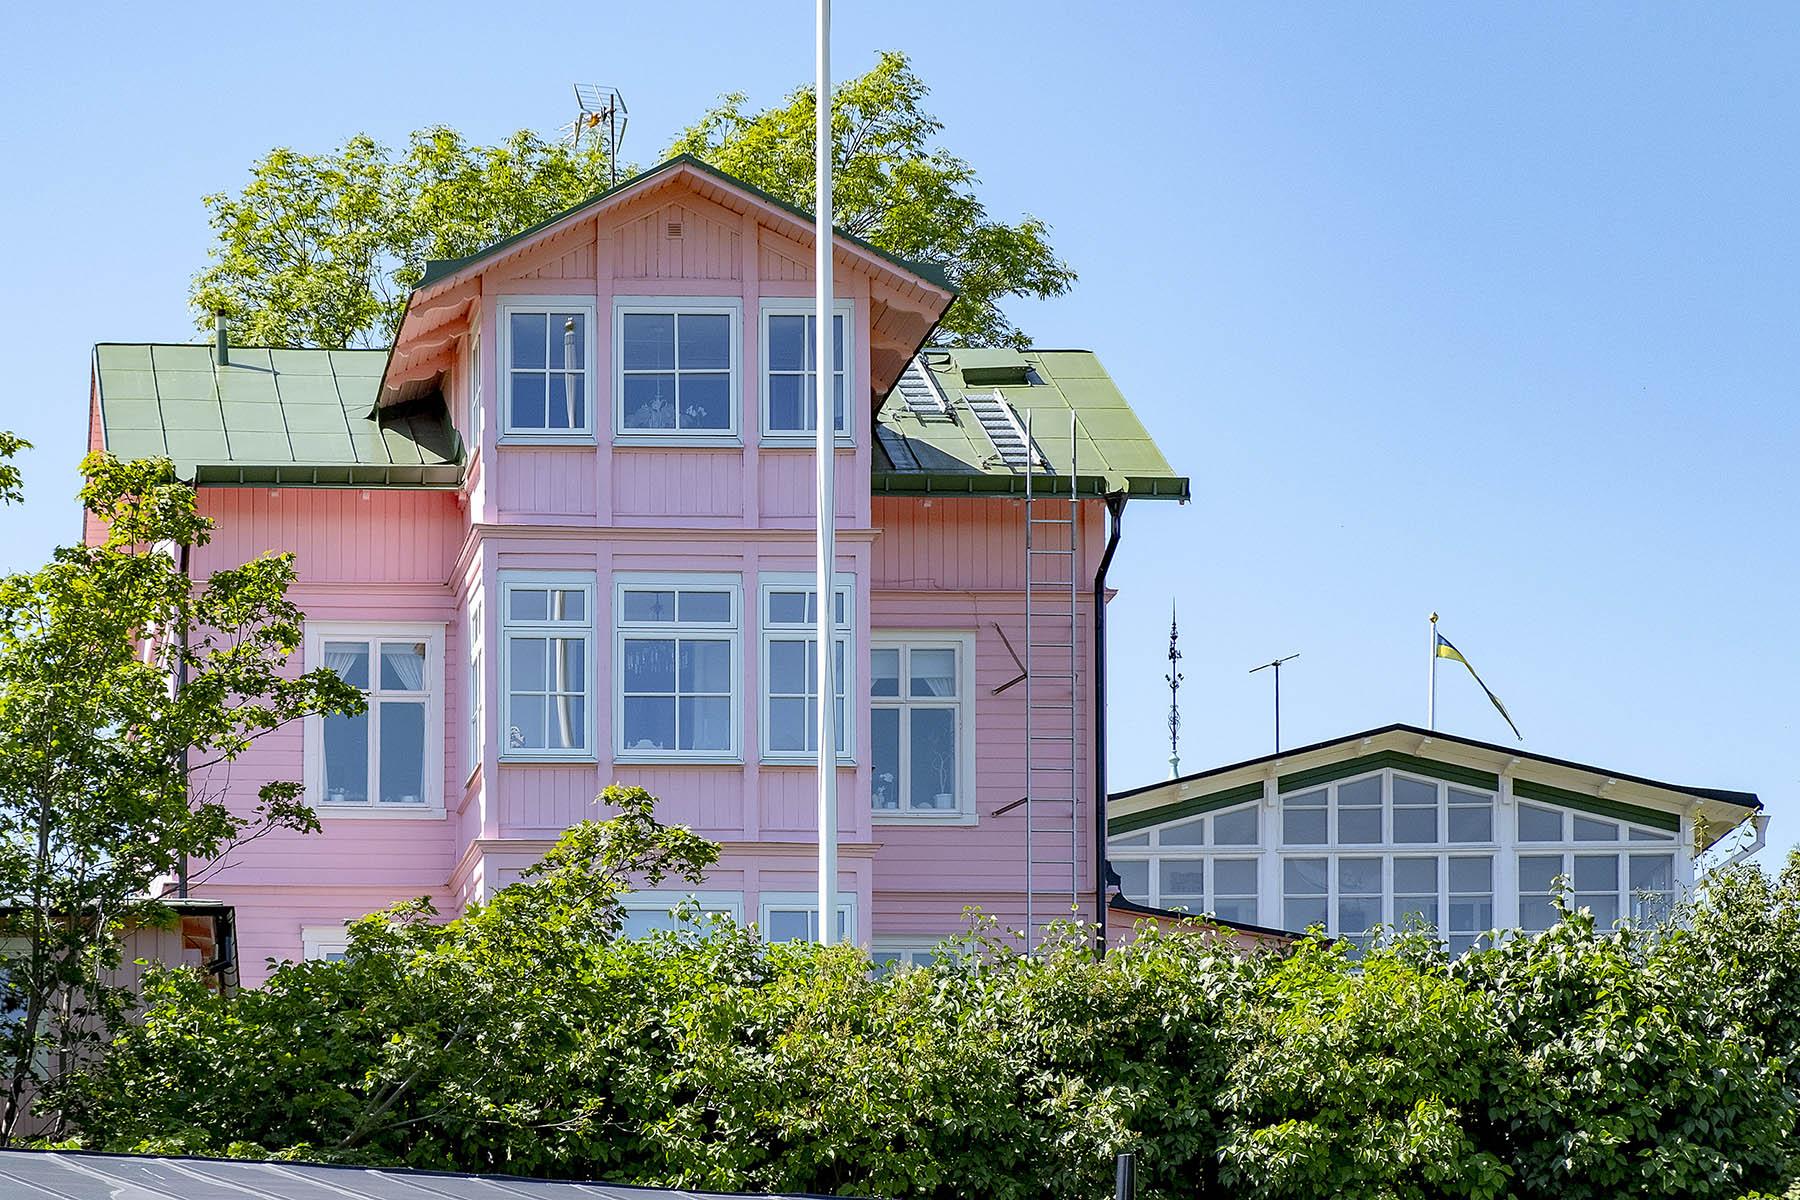 Rosa hus i Vaxholm